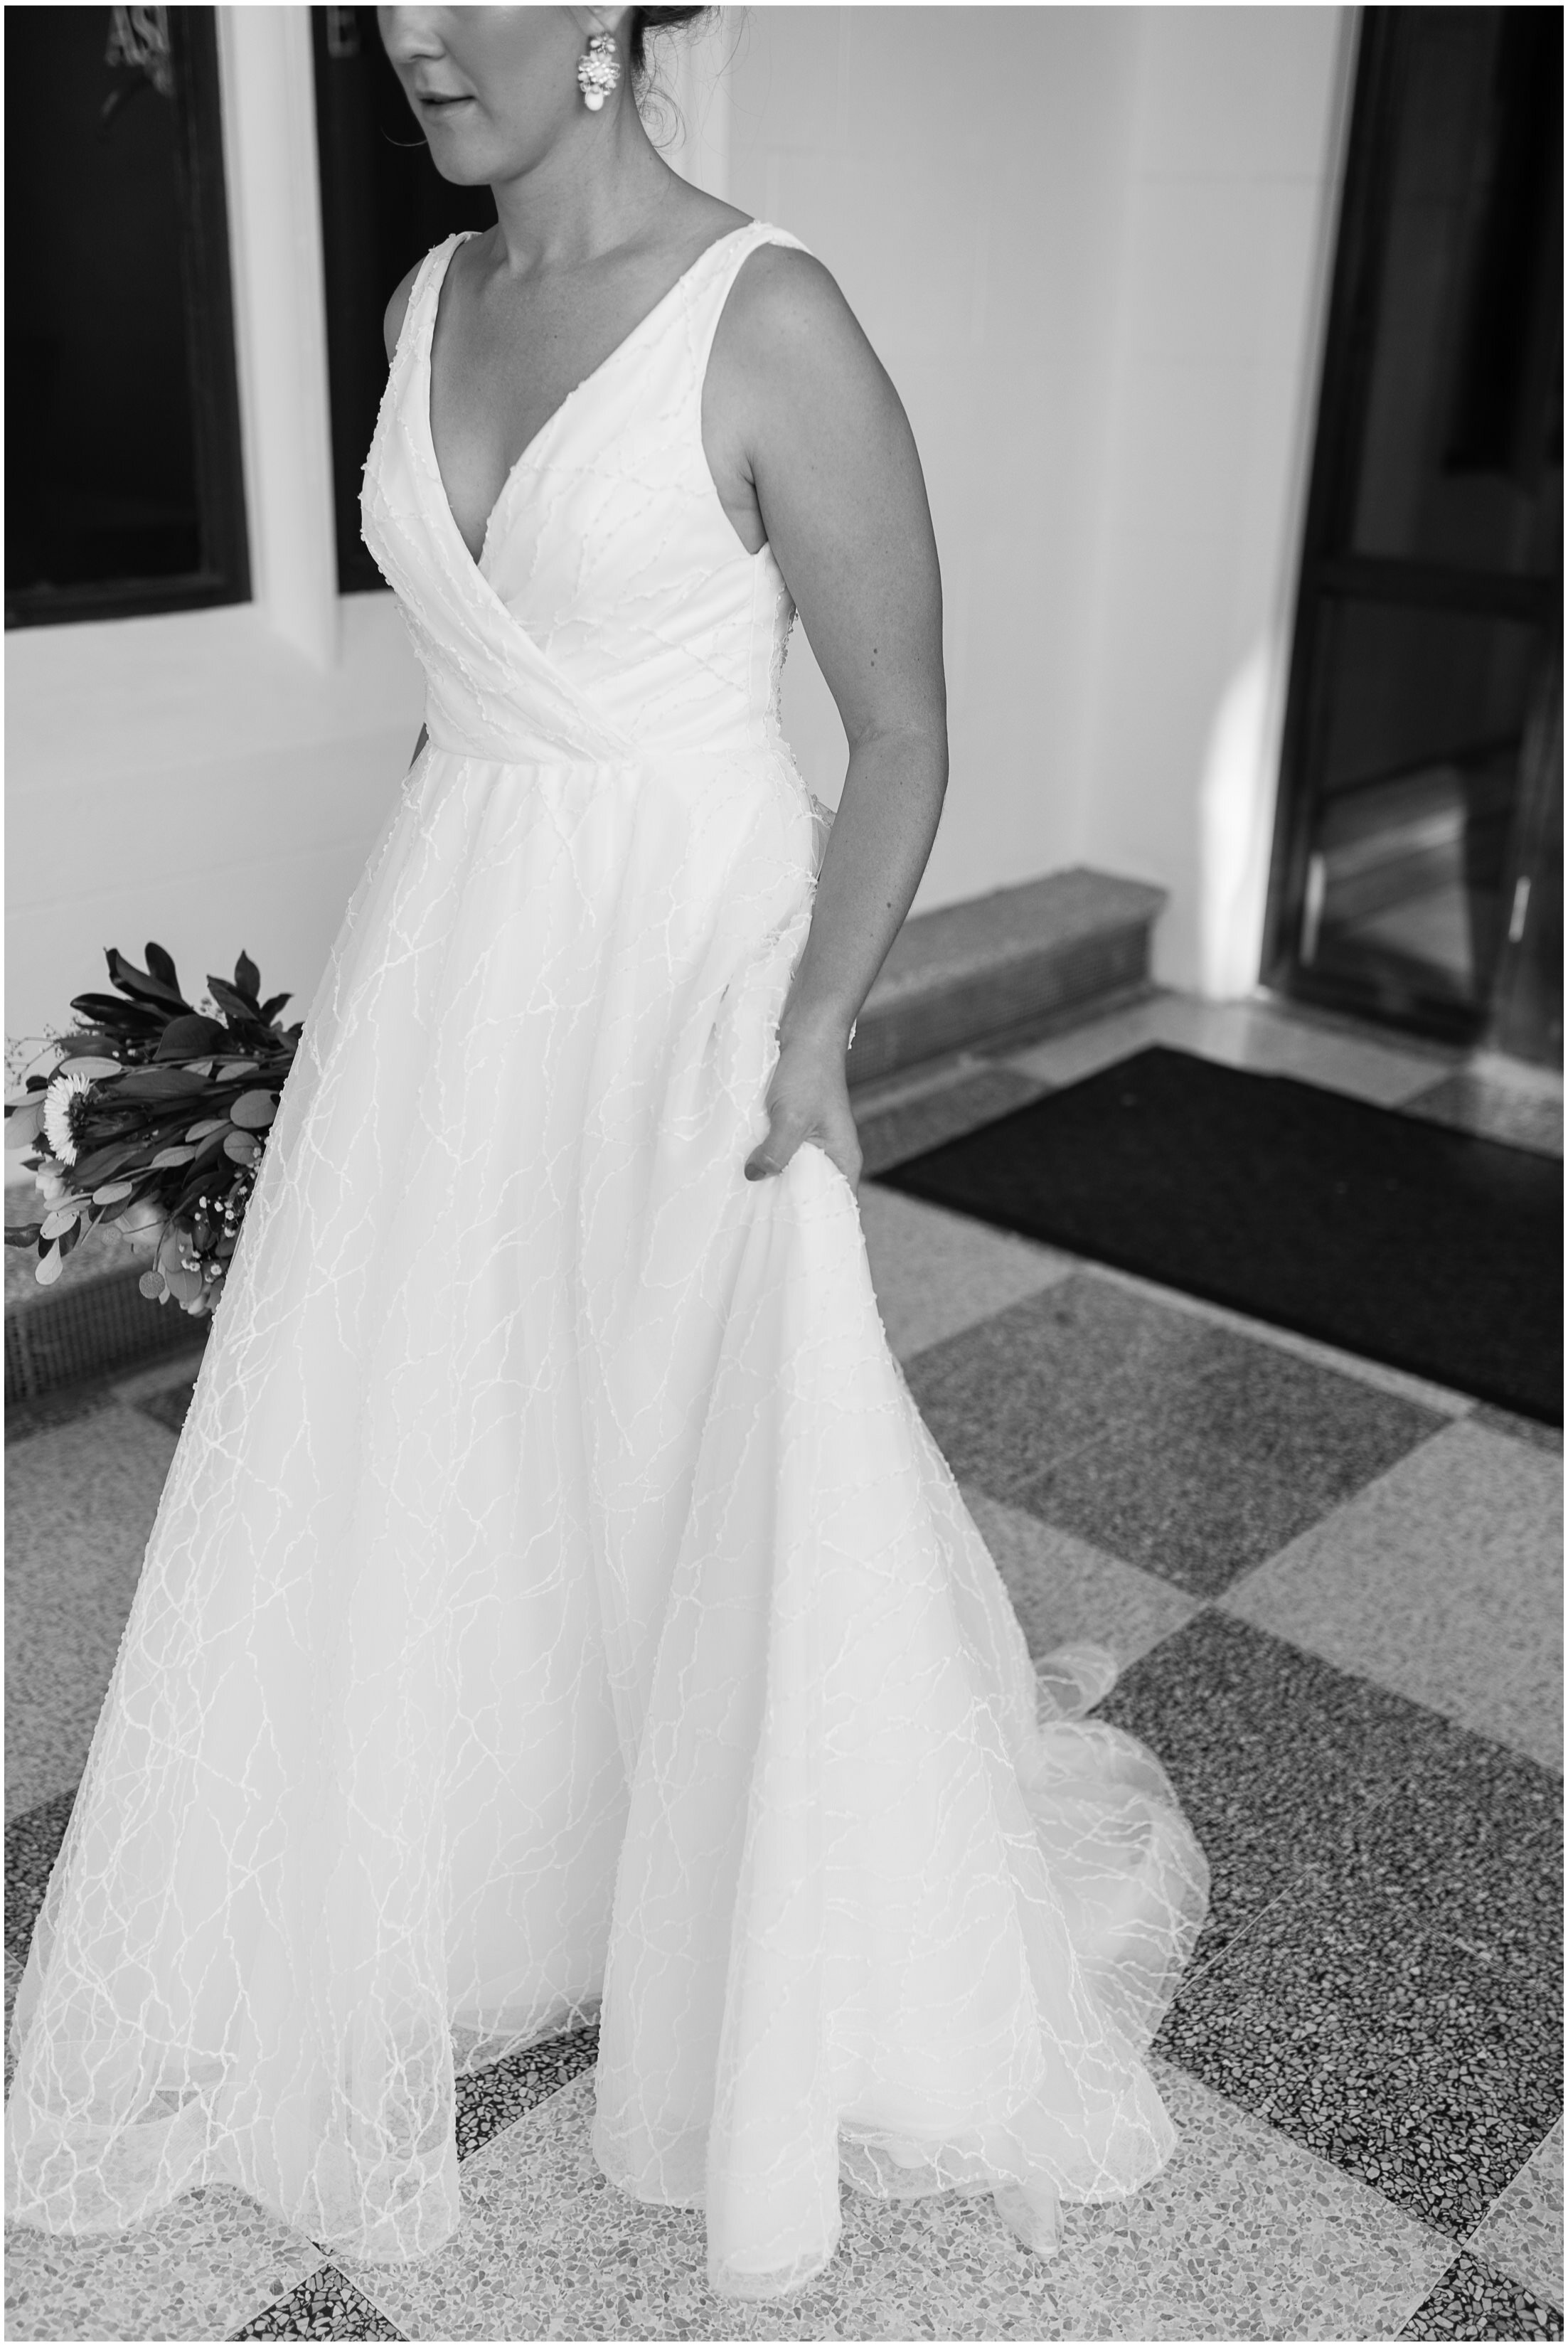 refinery-brisbane-wedding-photography-film-photographer-fine-art-32.jpg